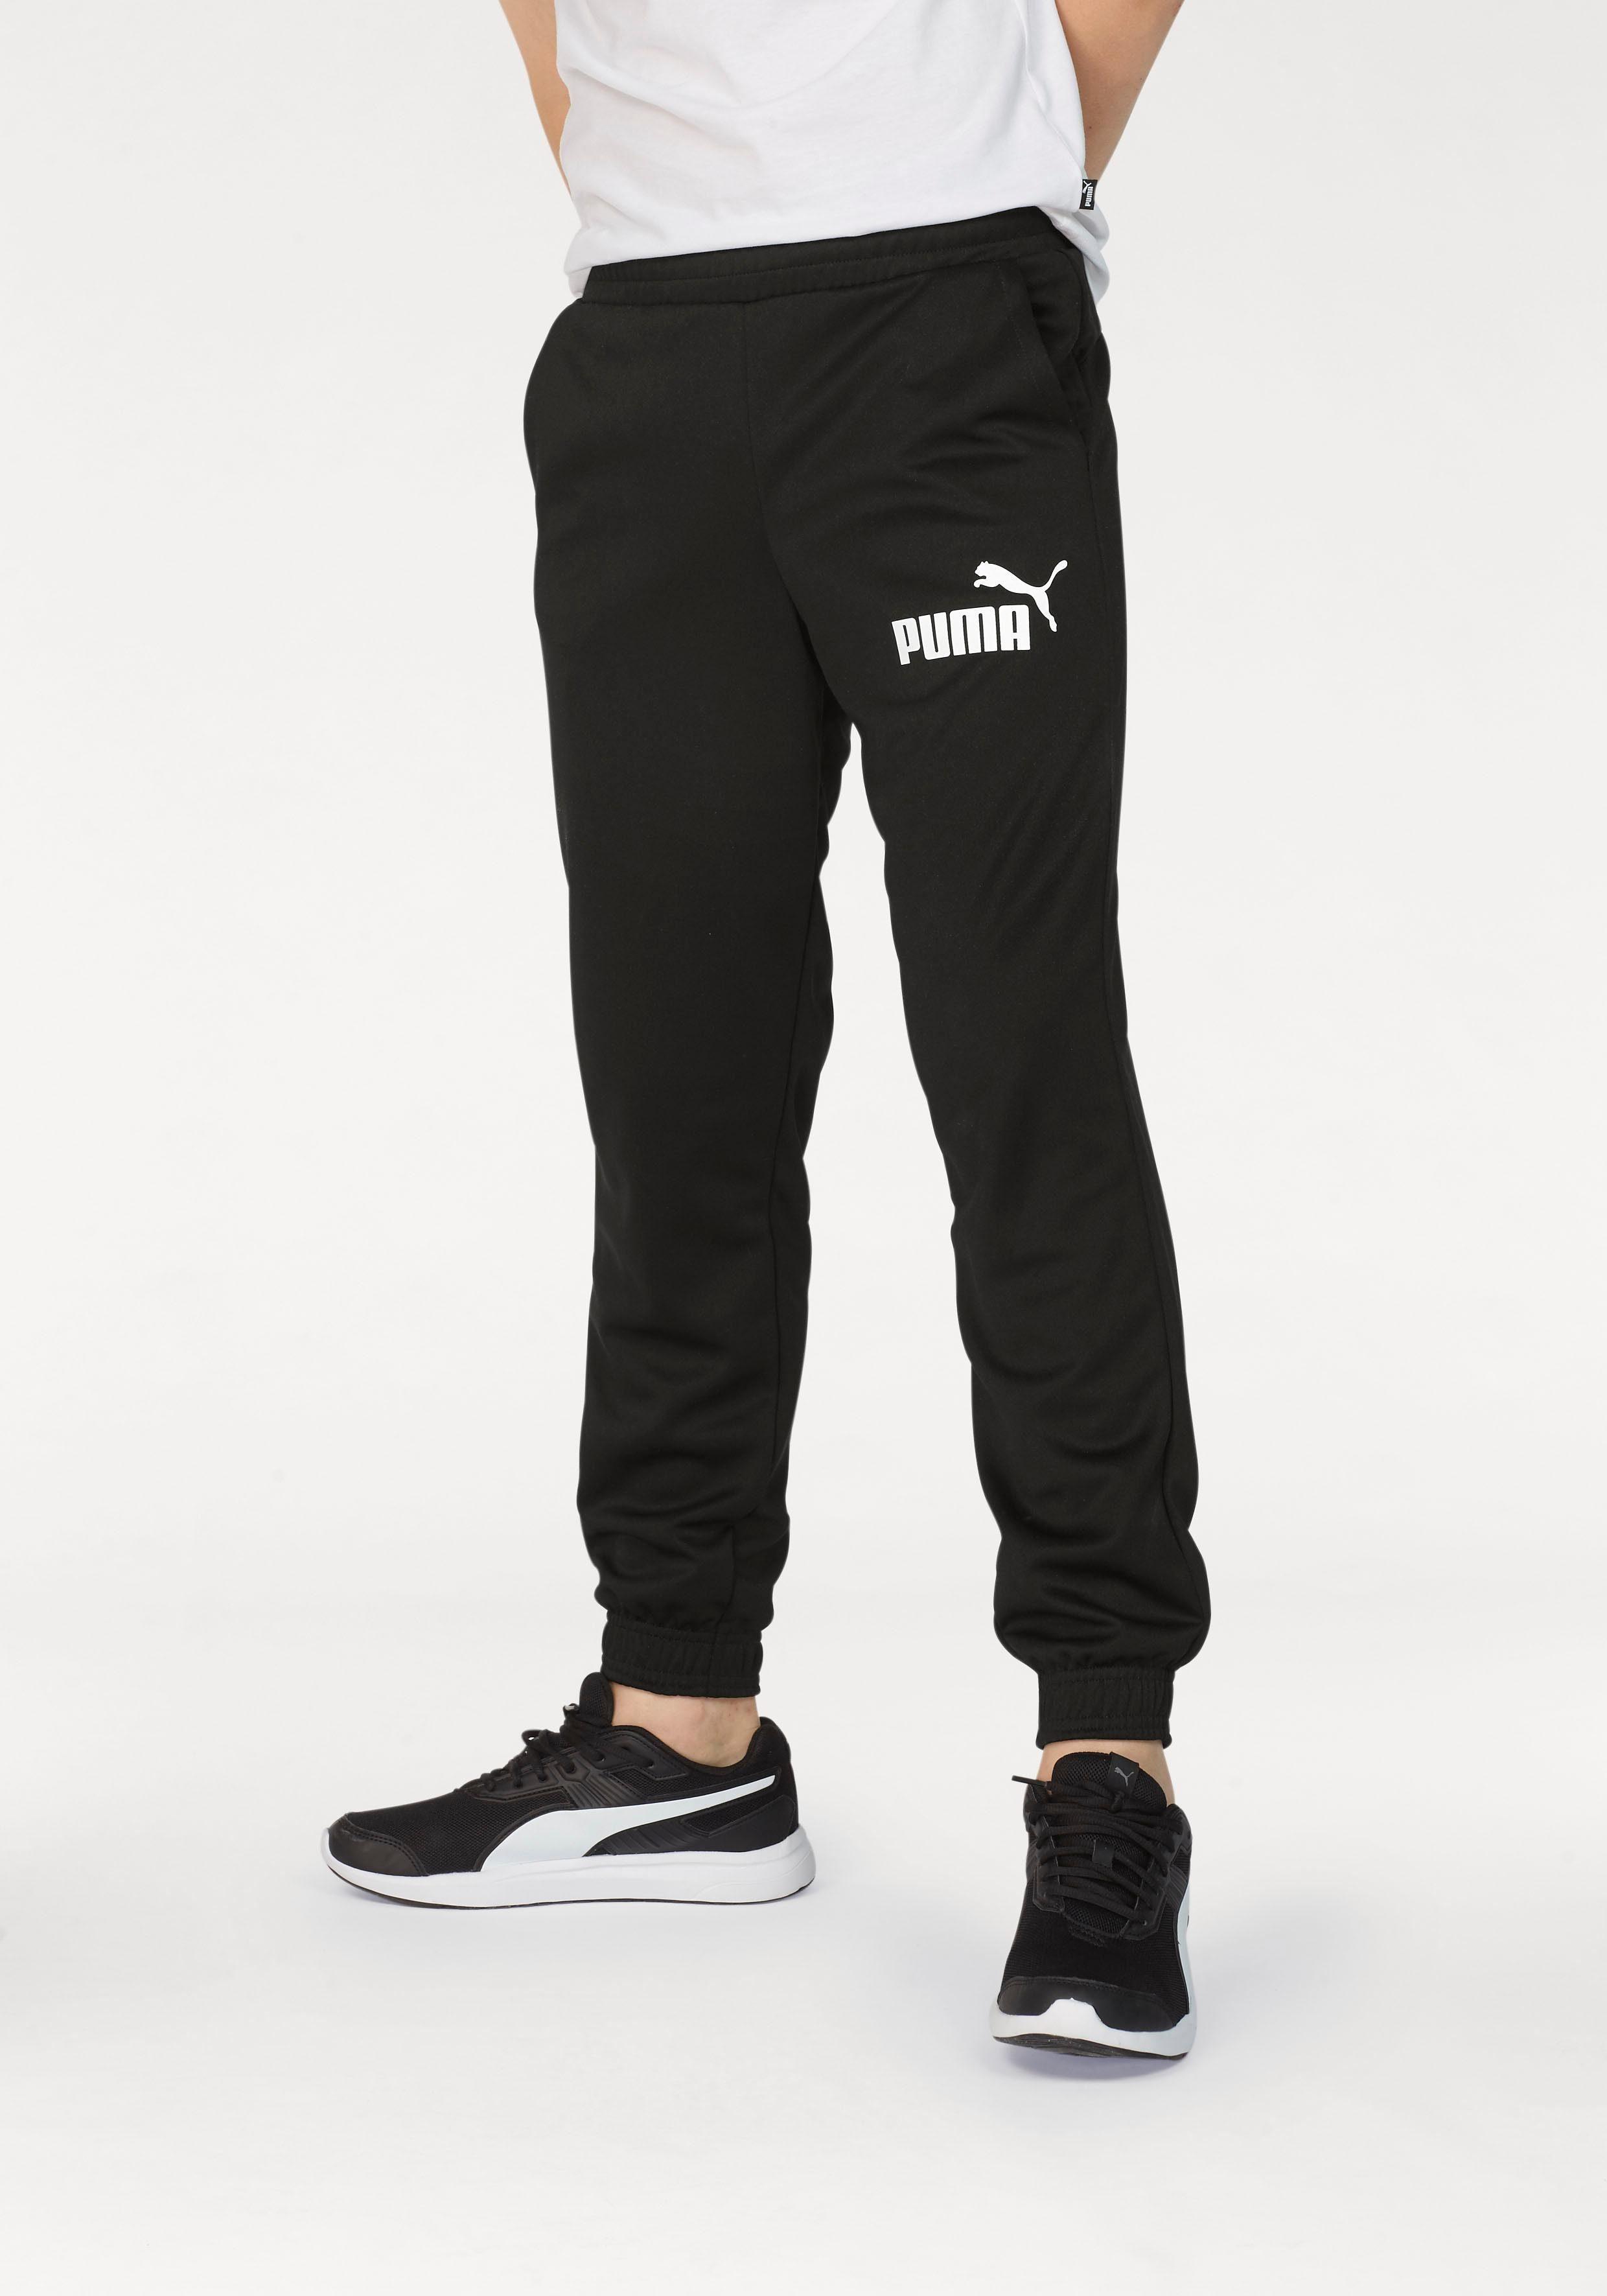 PUMA Sporthose »ESS No. 1 Poly Pants, cl B« kaufen | OTTO